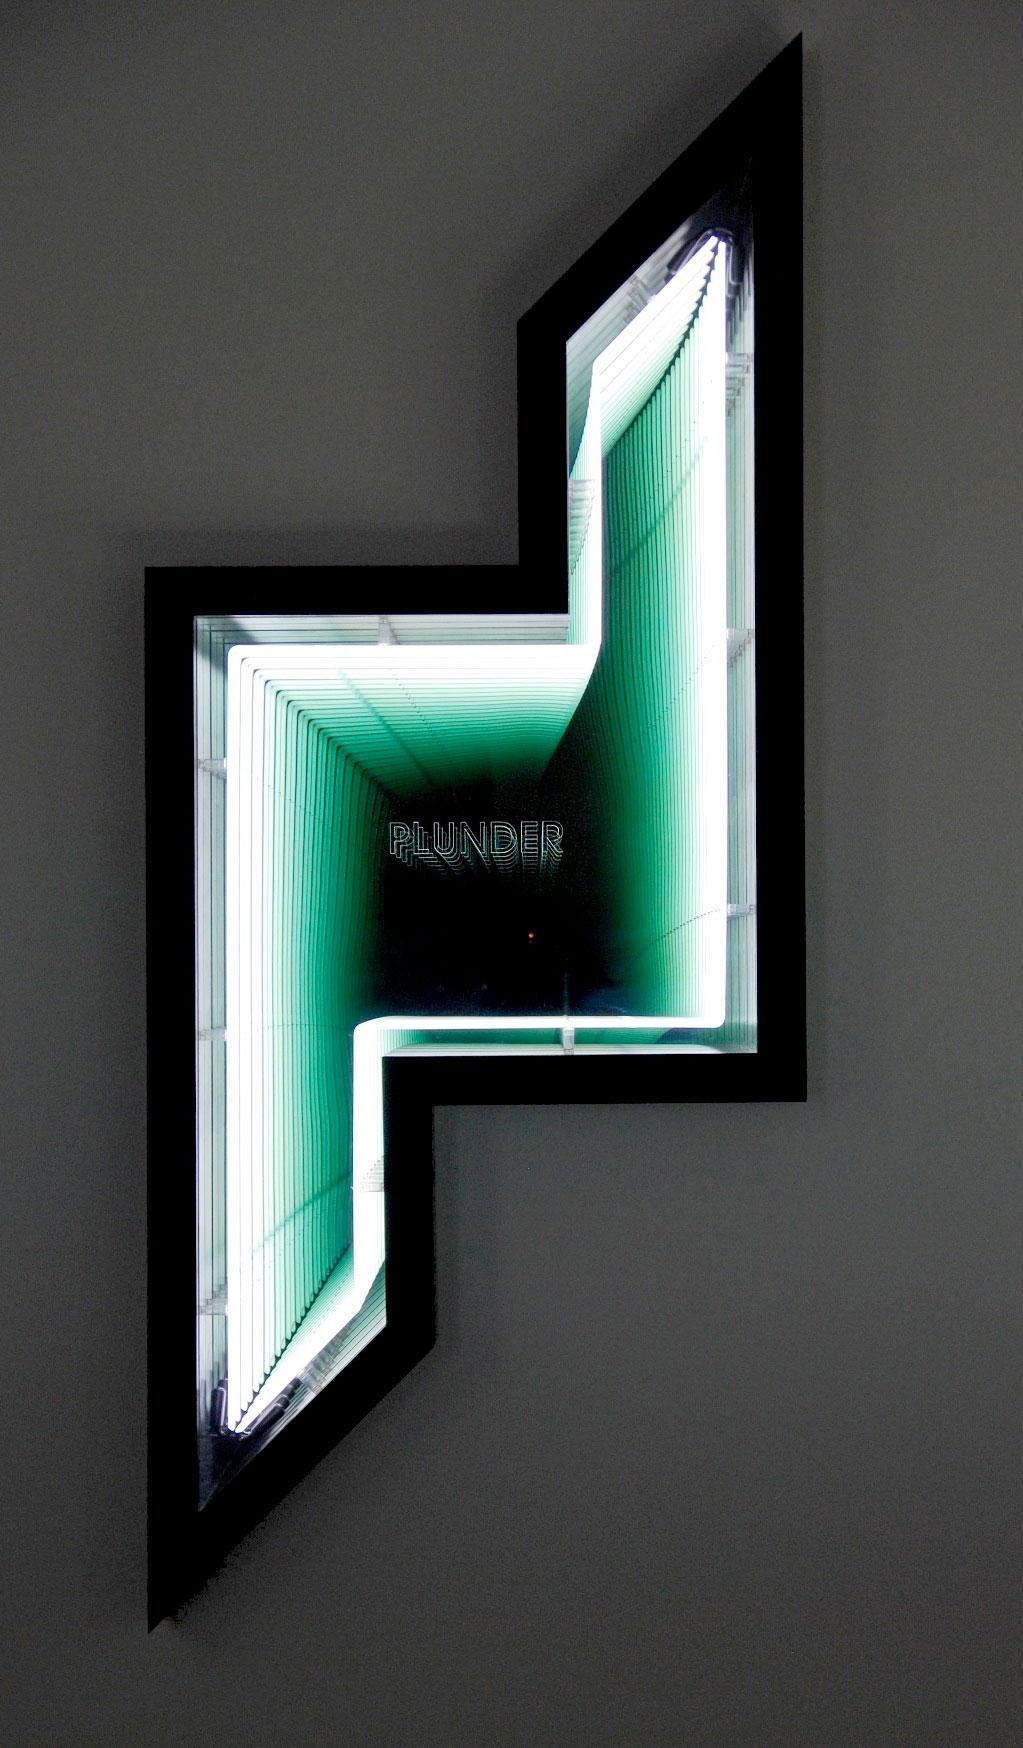 Ivan Navarro, Plunder (Dubai Towers - Doha), 2011.Neon , wood, paint , Plexiglas , mirror, two-way mirror and electricity, 249 x 103 x 18 cm. Photo courtesy Galerie Templon, Paris and Brussels.